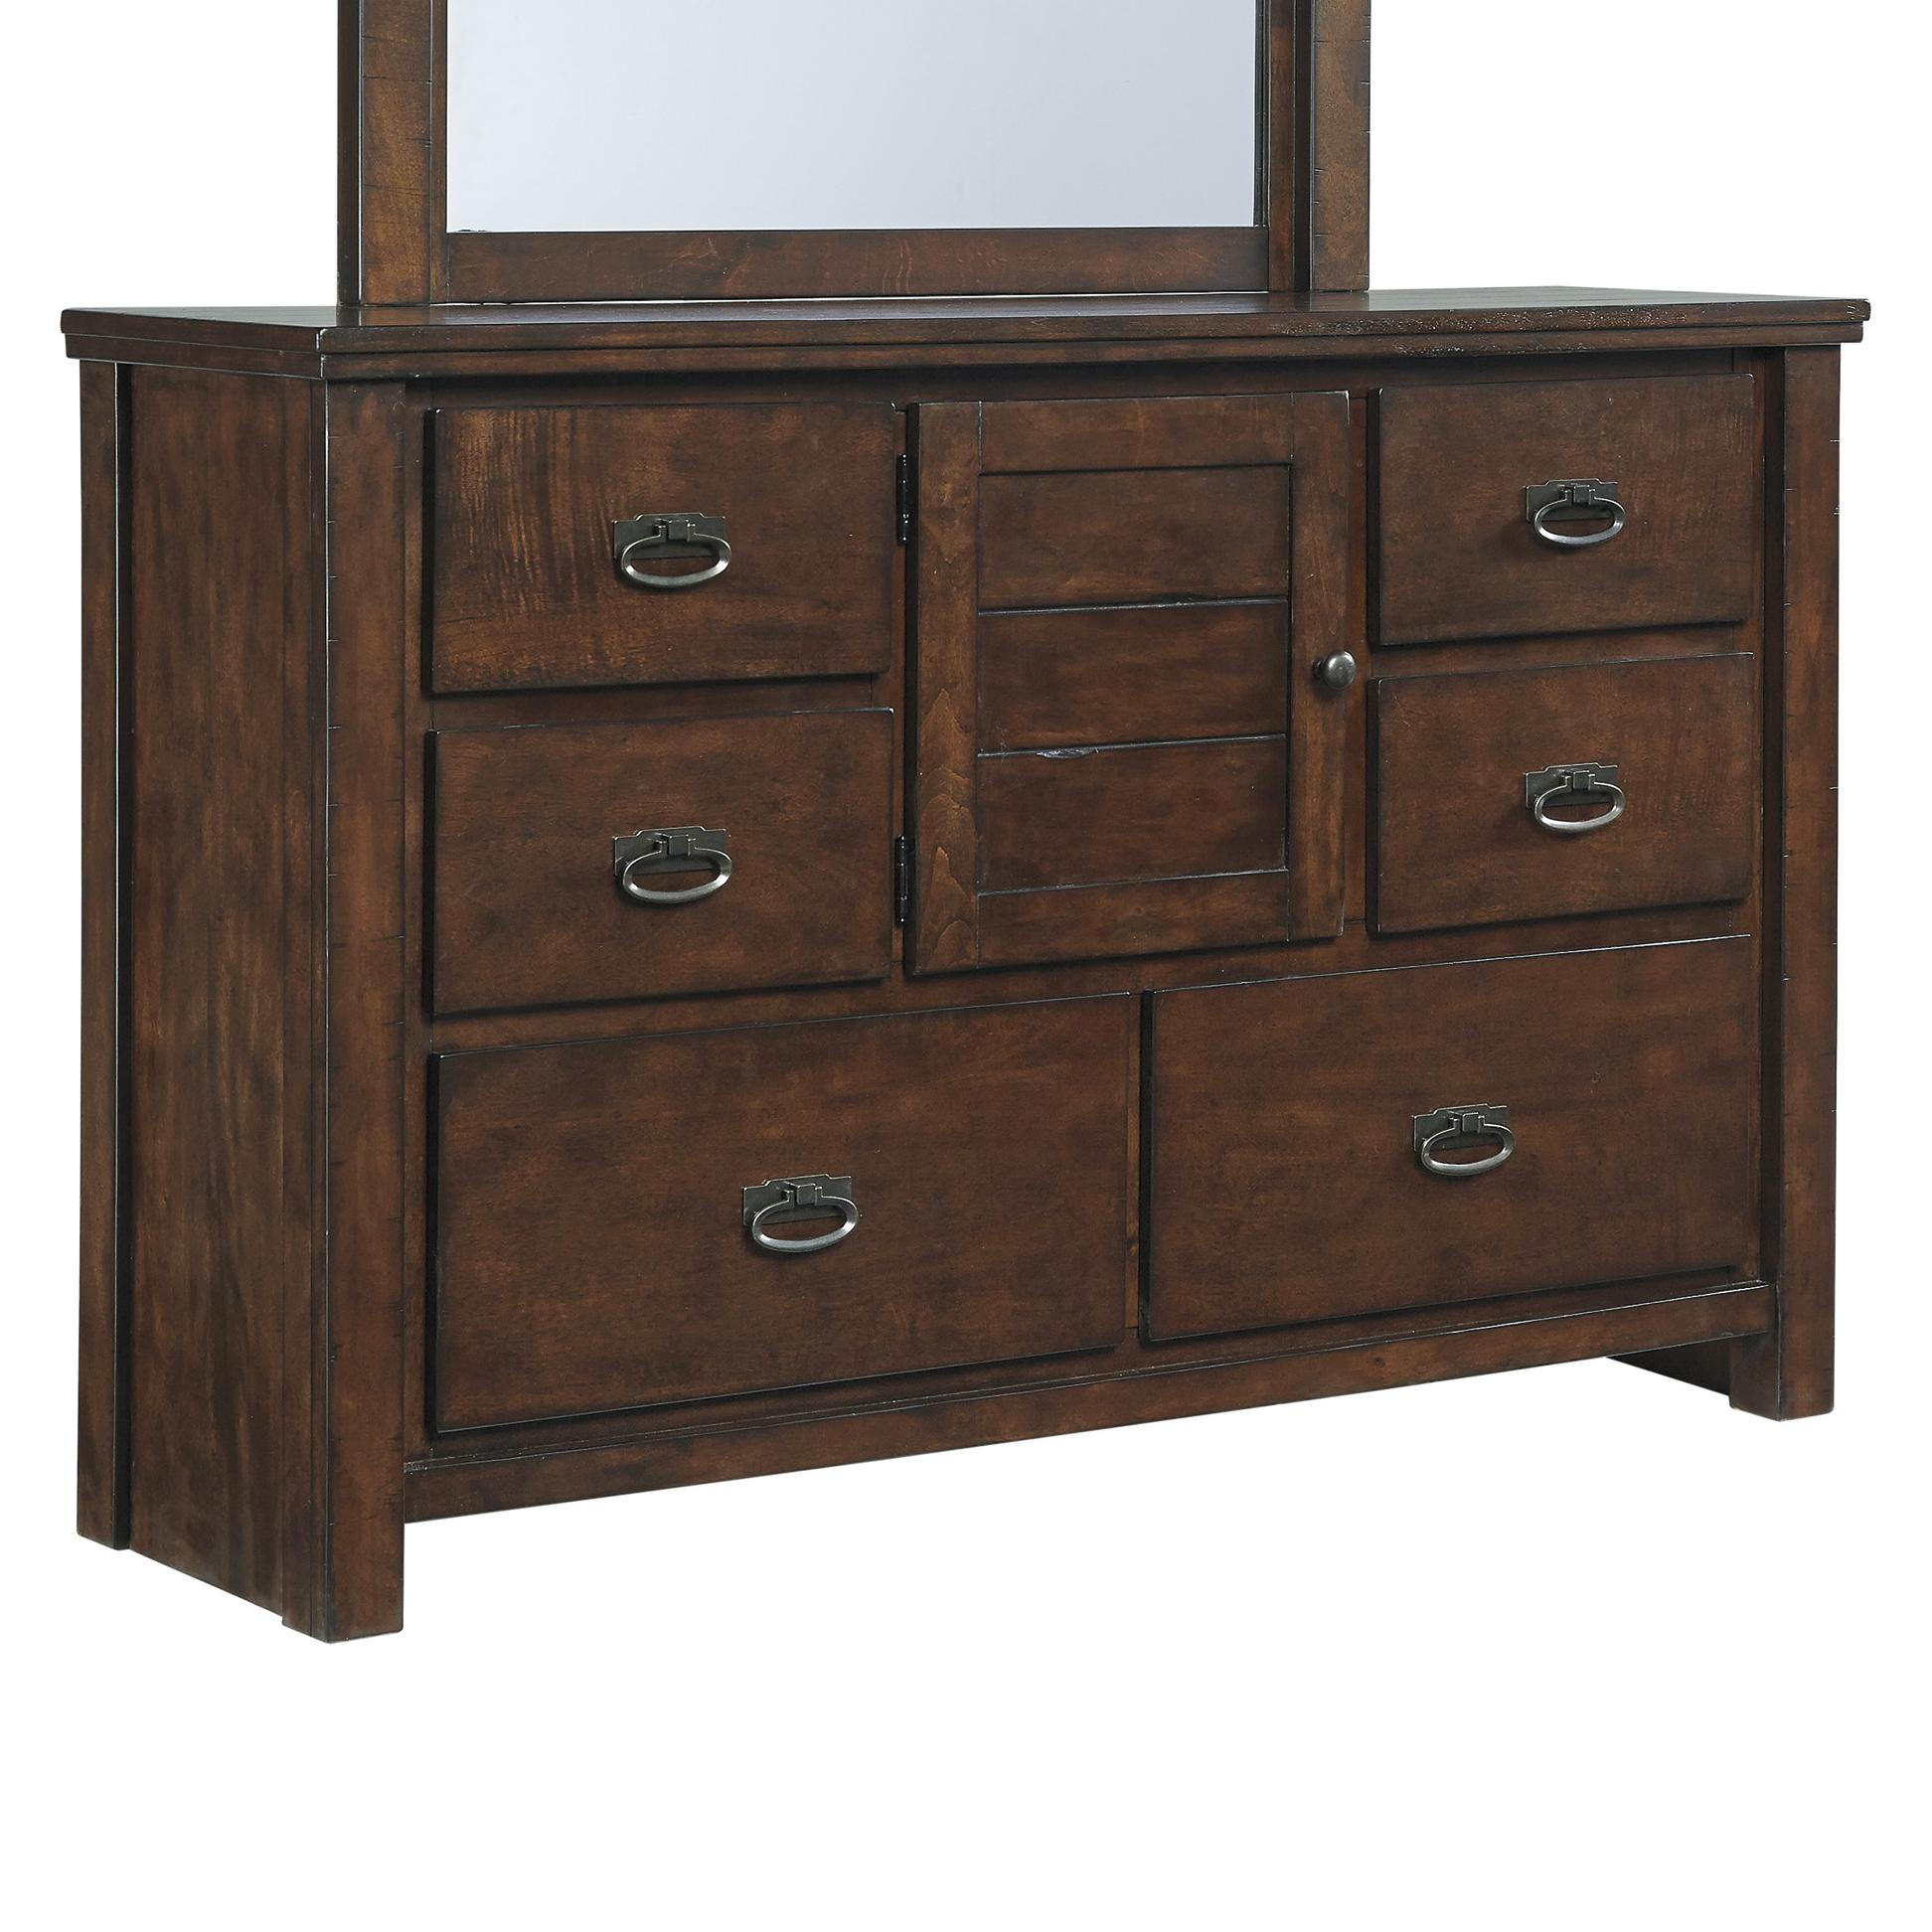 Signature Design By Ashley Ladiville B567 21 Dresser